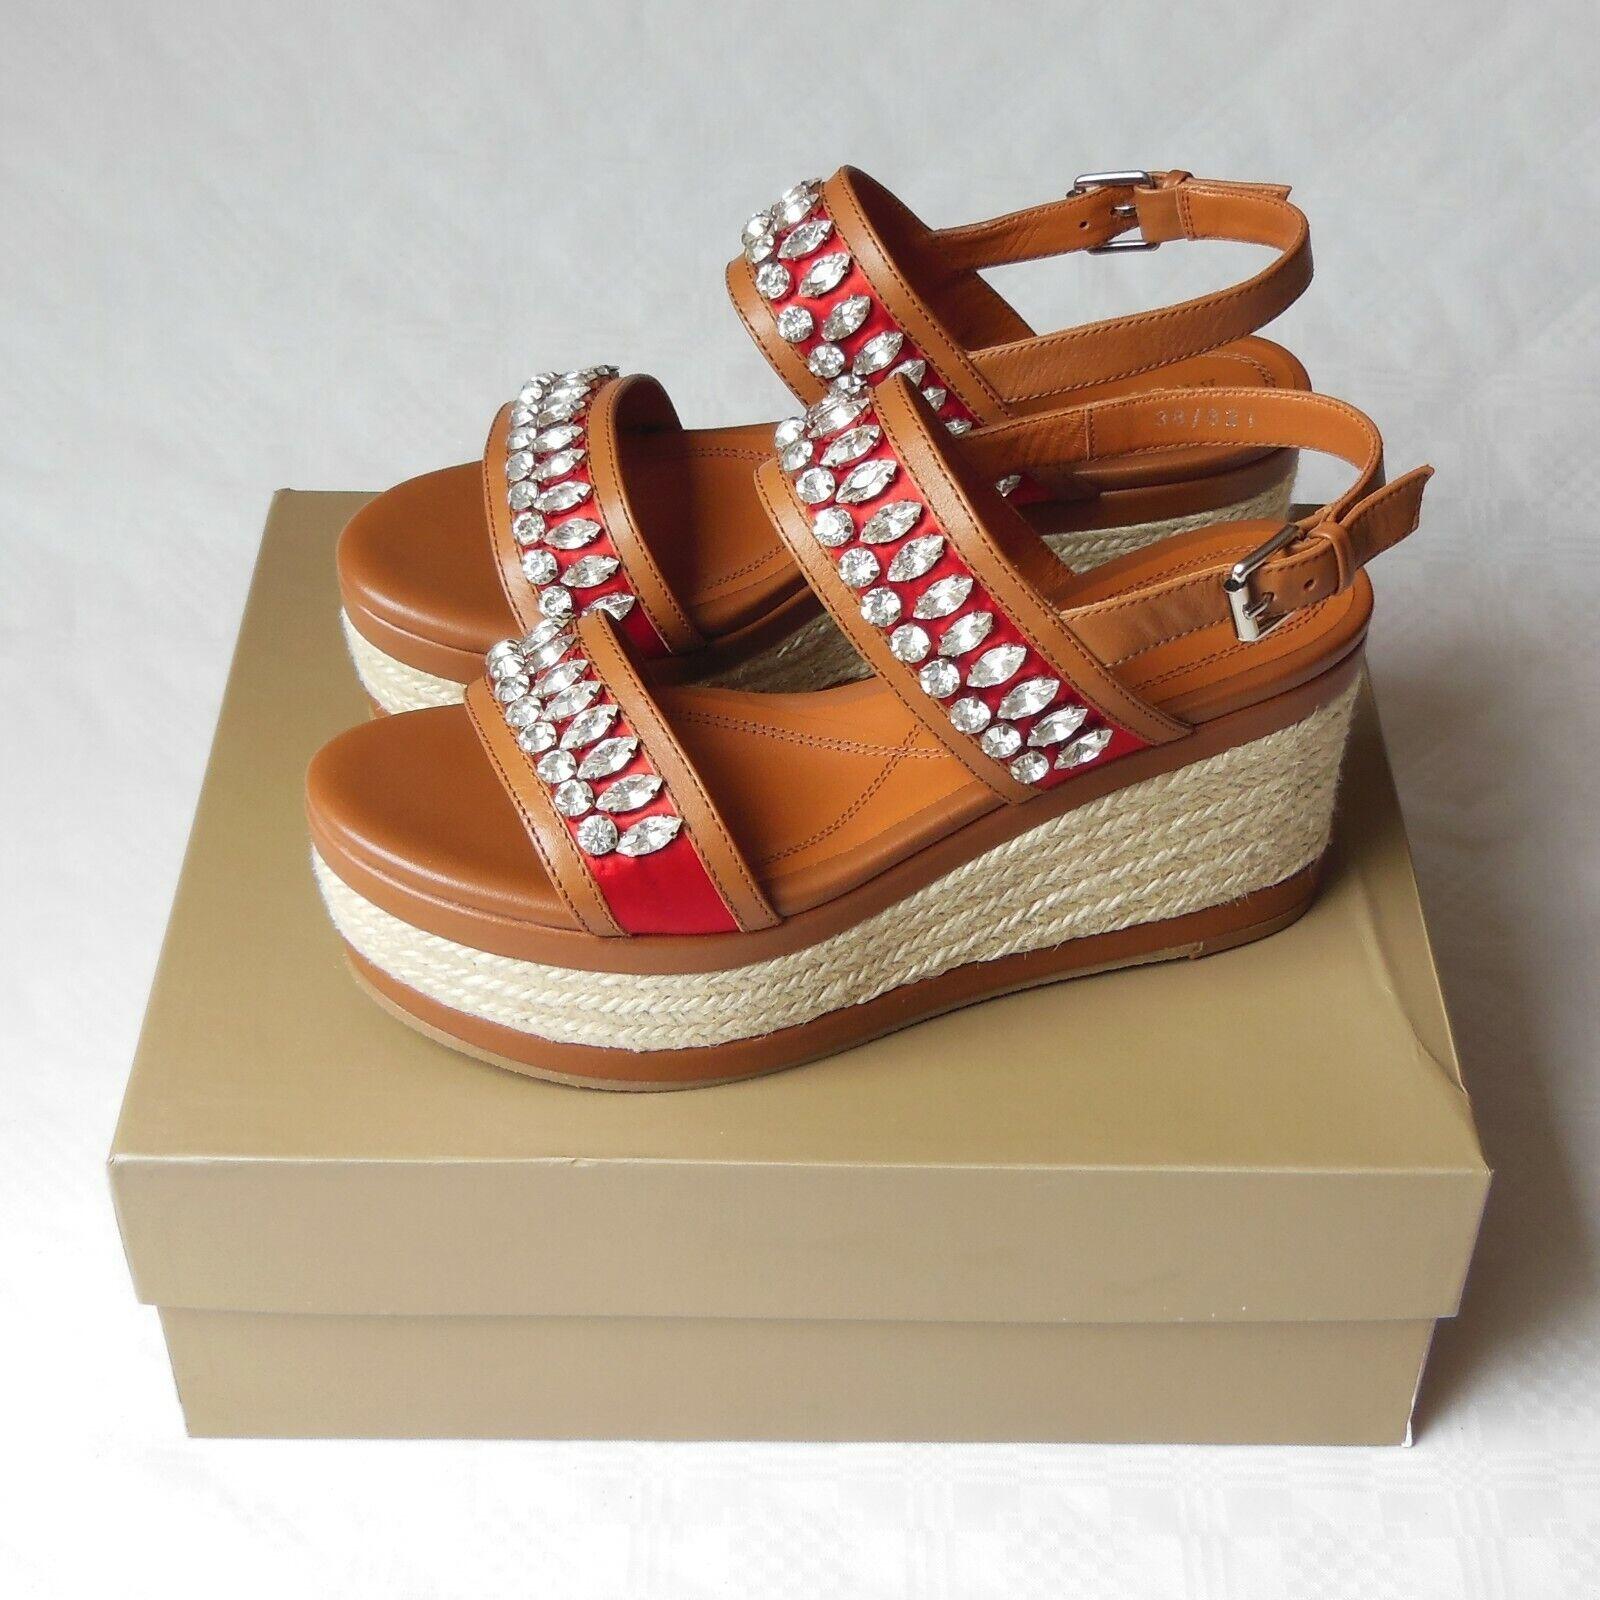 BRUNO PREMI Damen Sandalen   Sandaletten   K3700X Sommer Urlaub Schuhe Strand